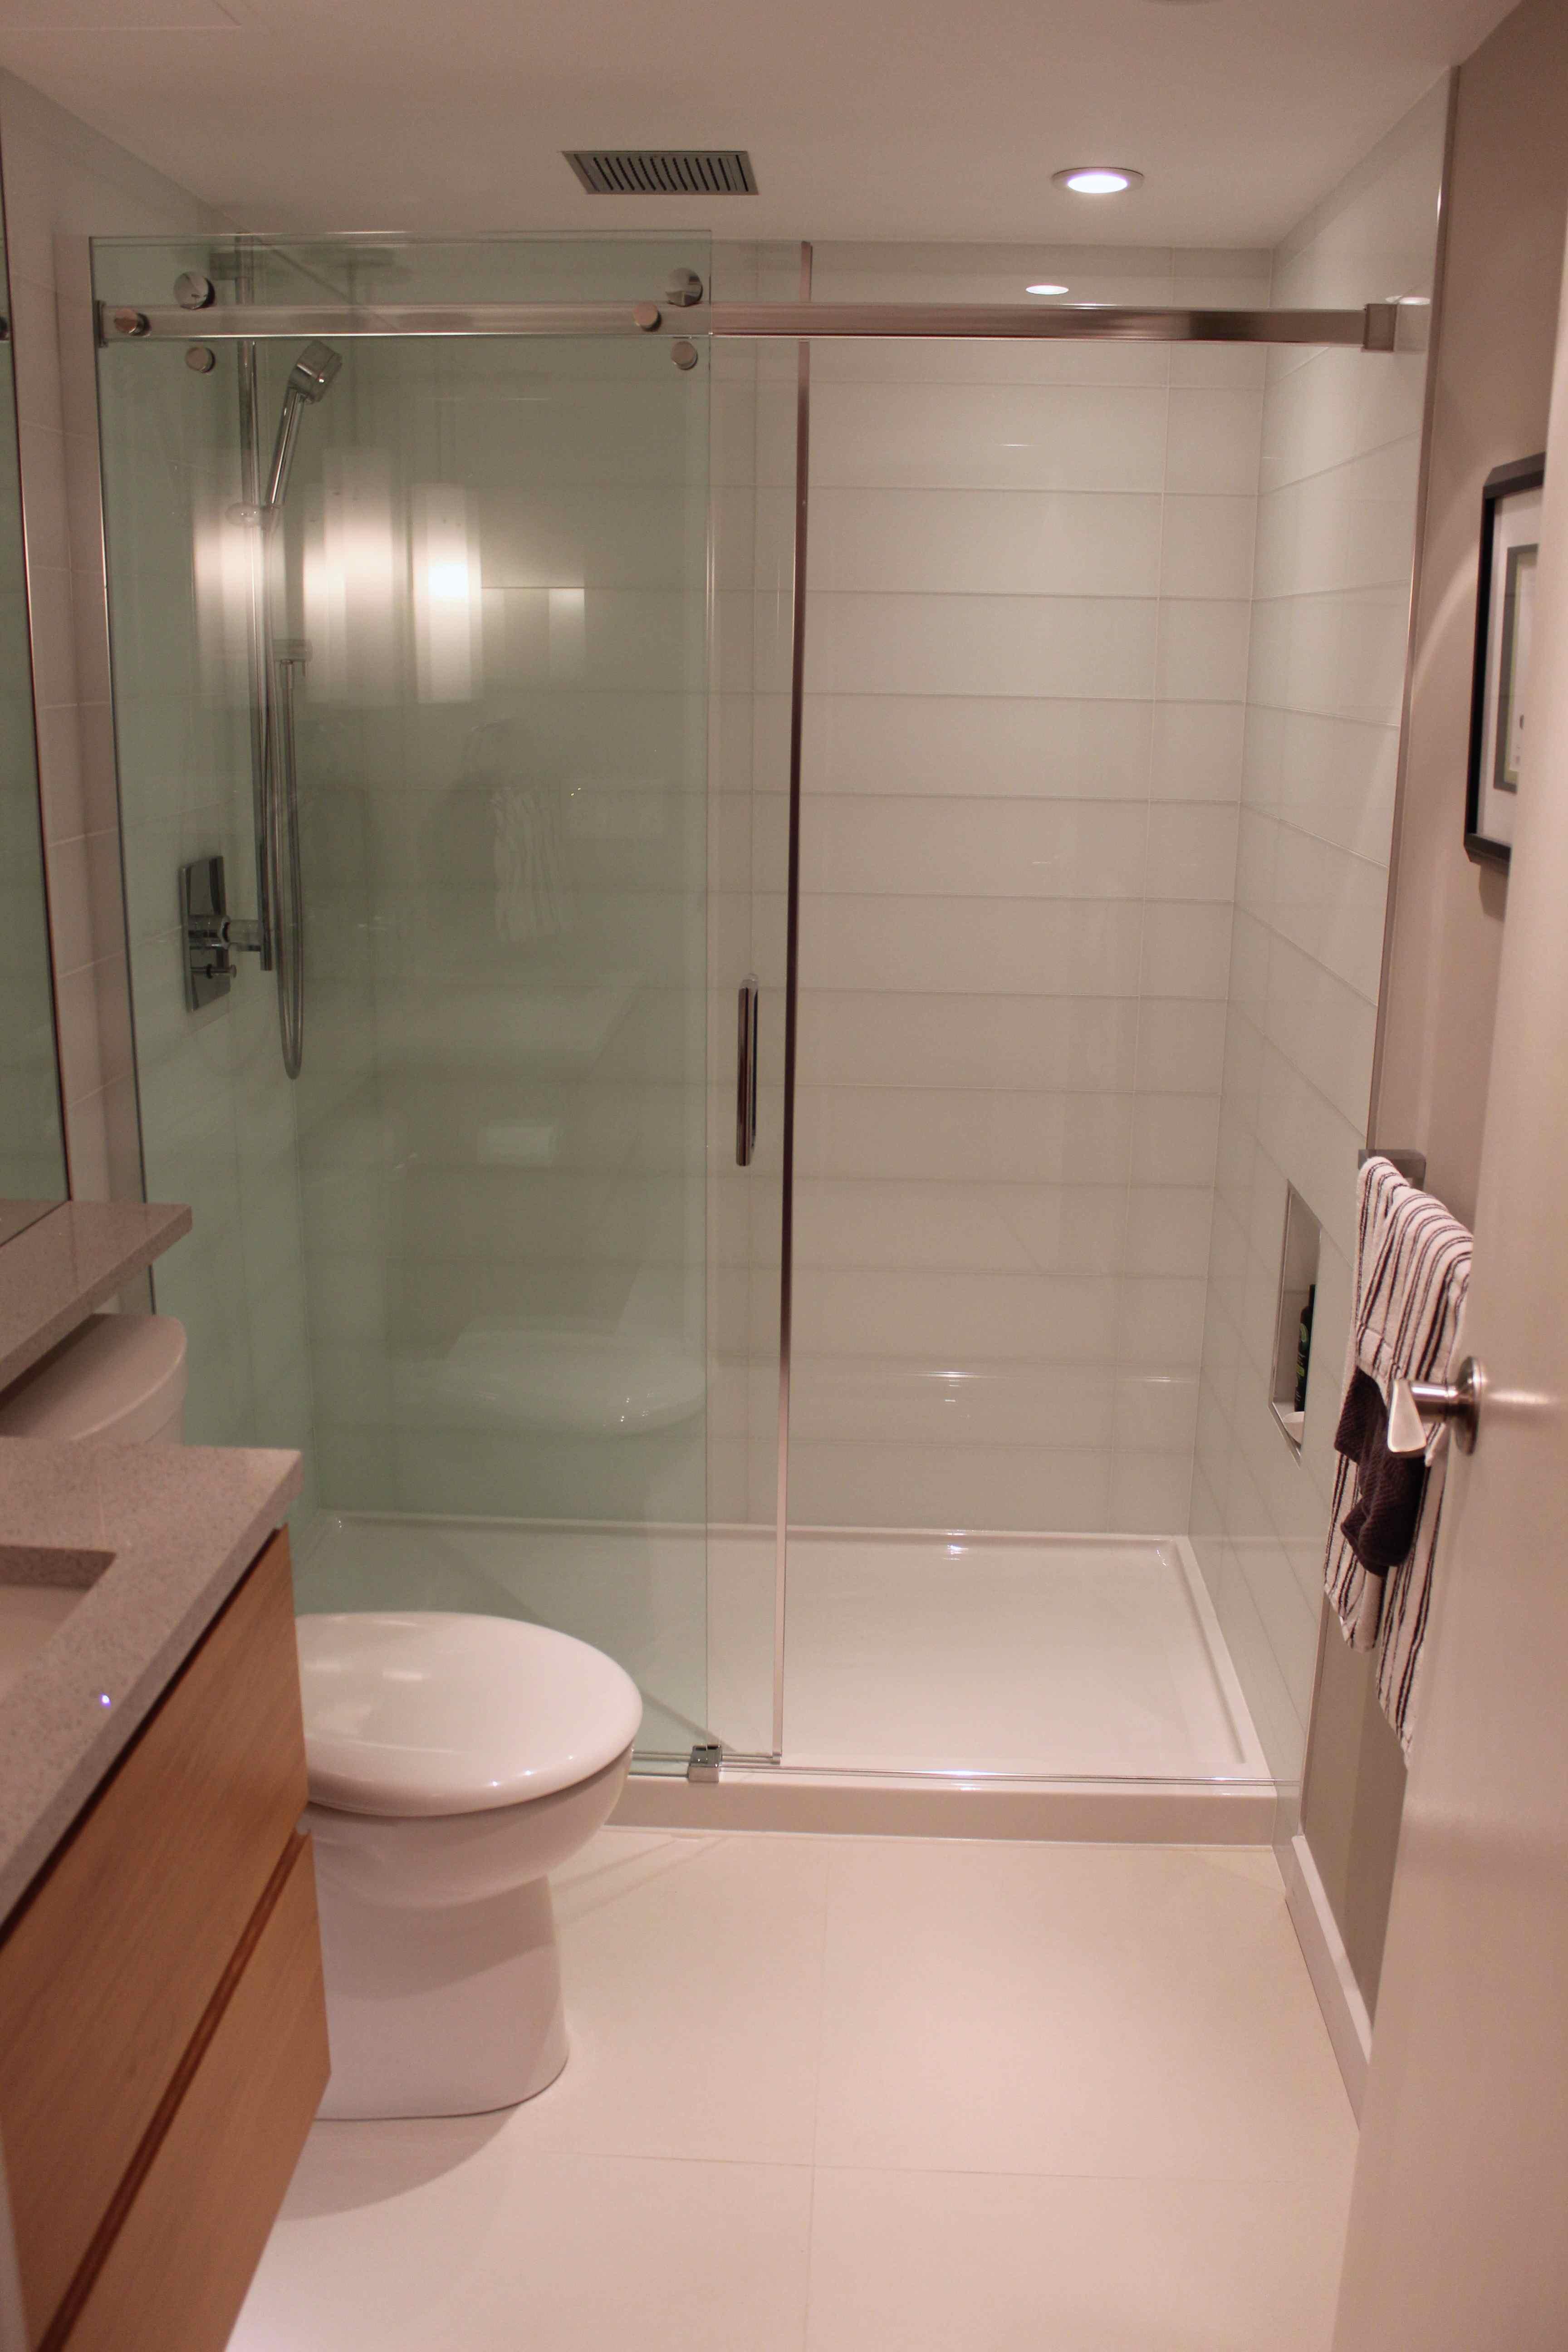 bathroom upgrade - M&D's guest bathroom shower pic